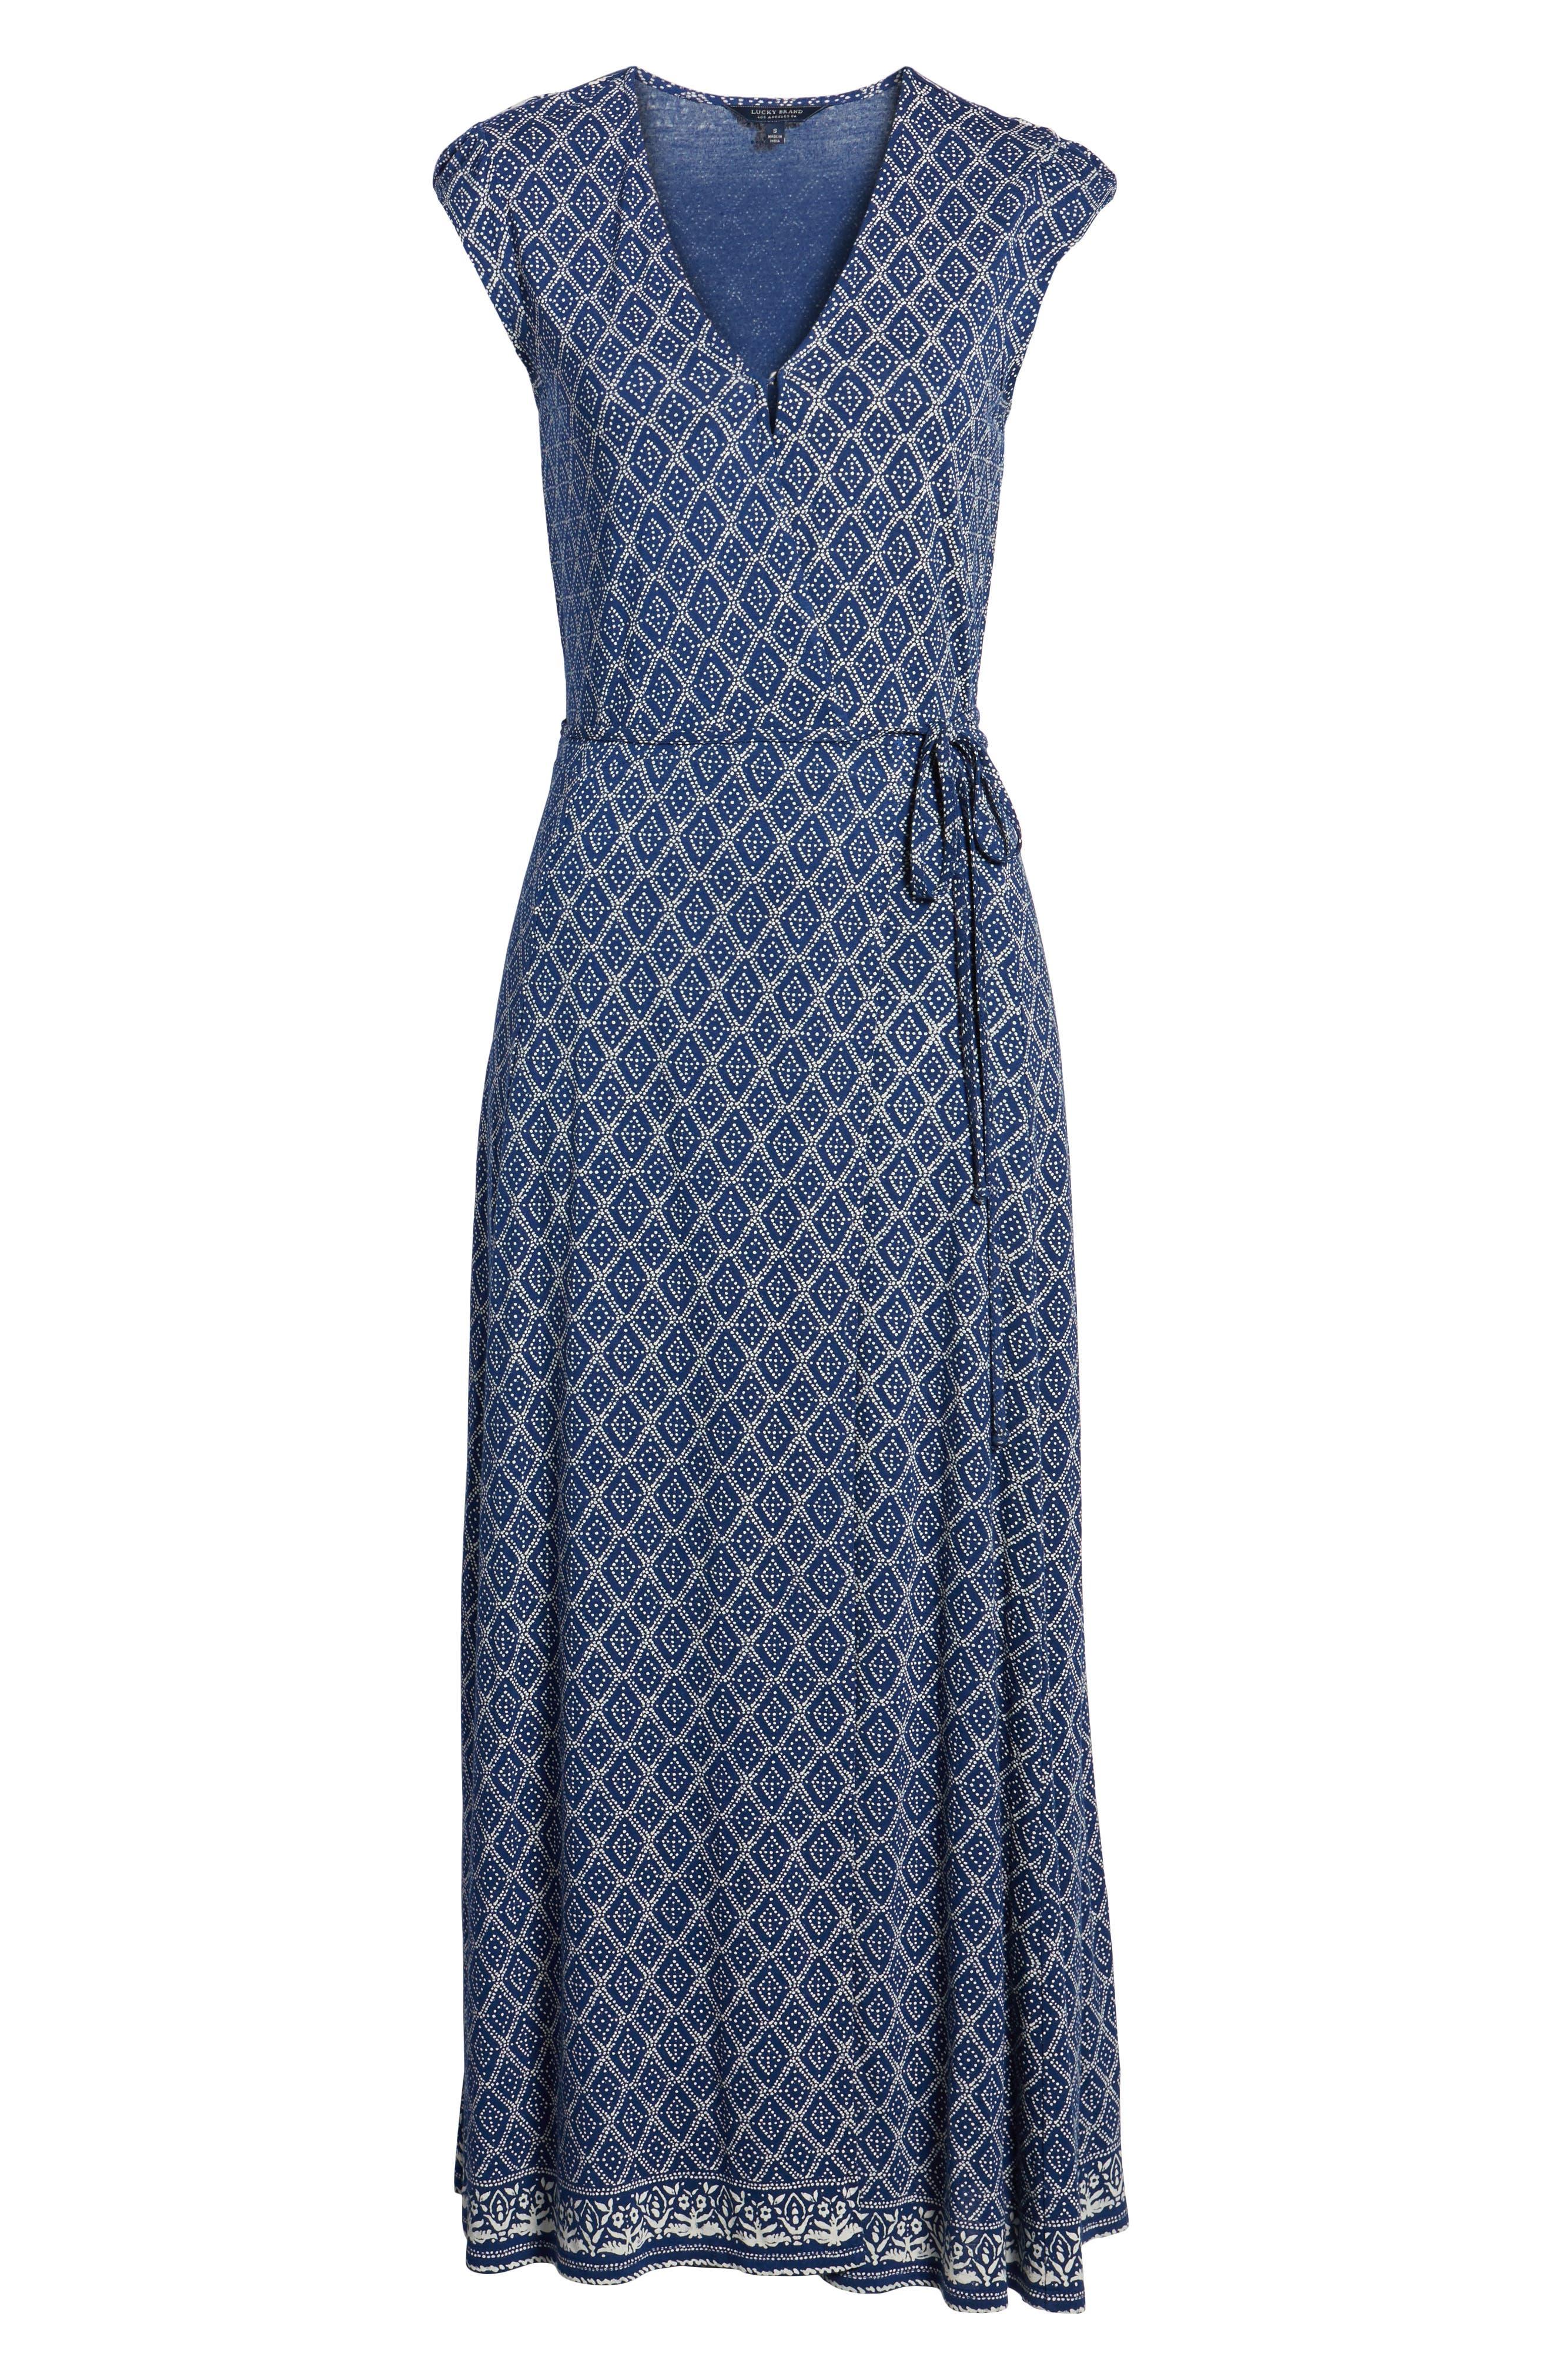 Lucky Border Print Maxi Dress,                             Alternate thumbnail 7, color,                             490